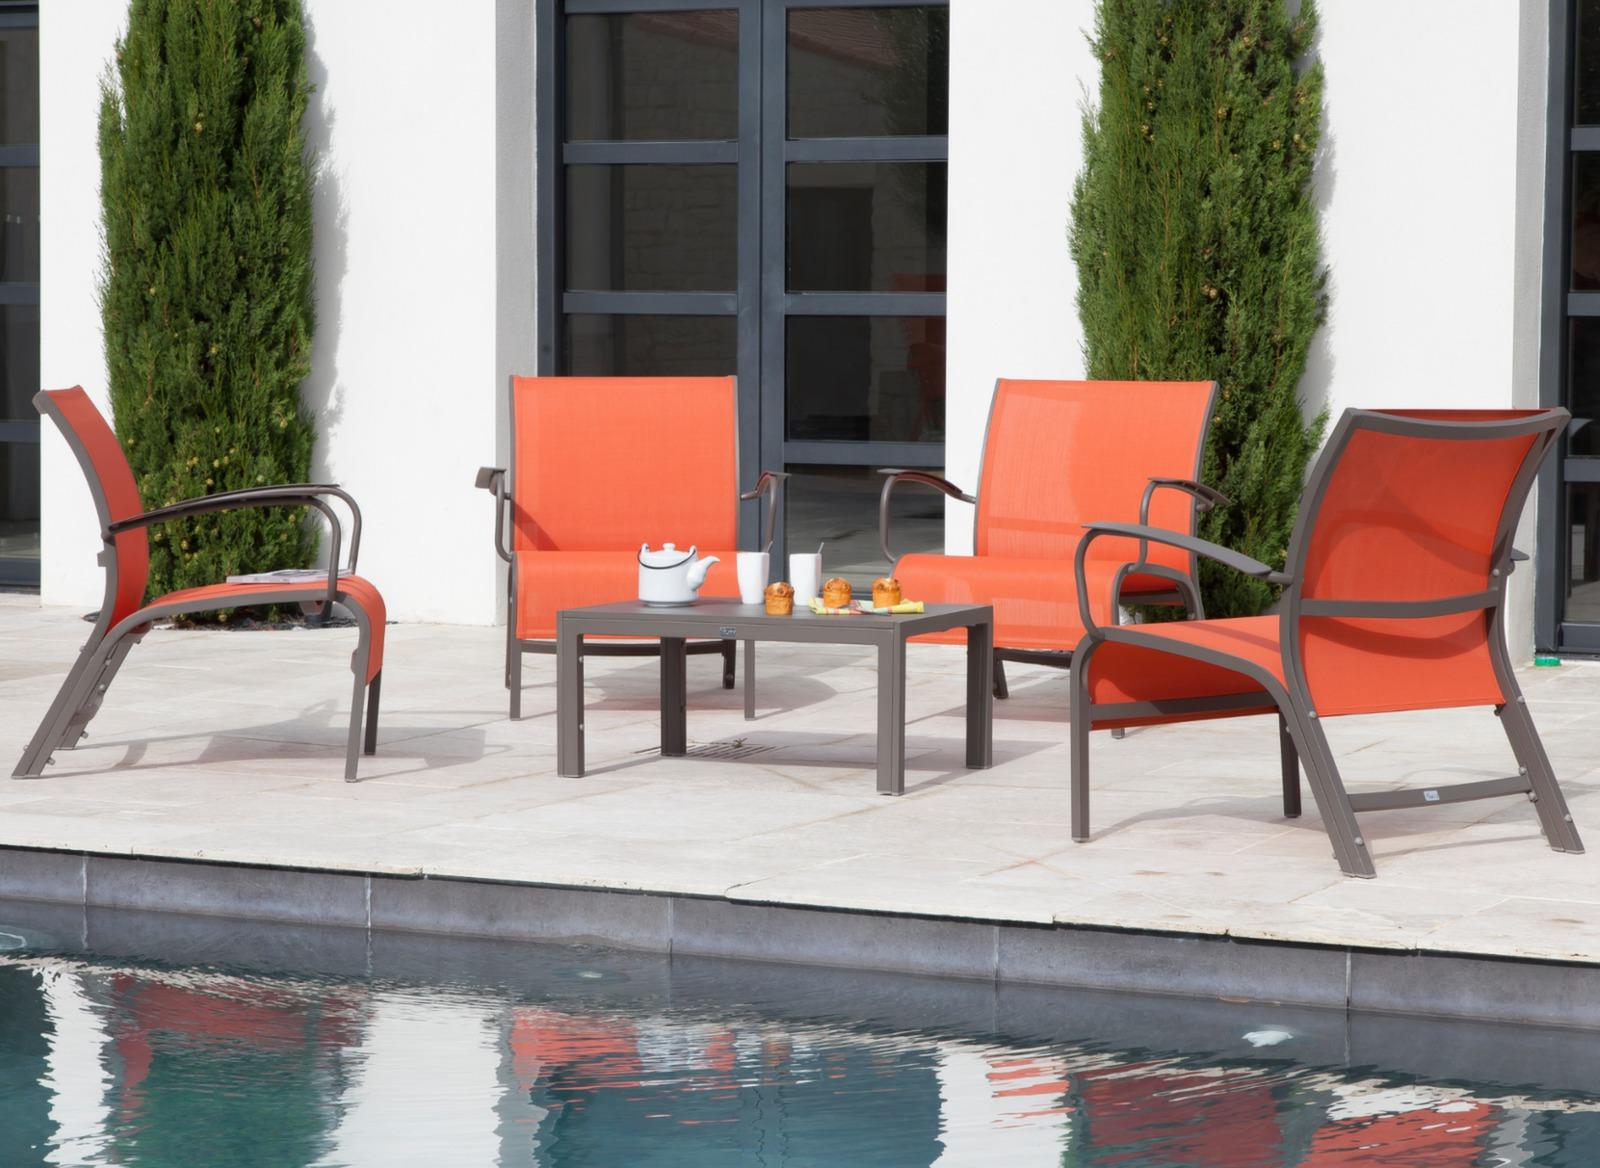 salon lounge aluminium textil ne linea meubles jardin. Black Bedroom Furniture Sets. Home Design Ideas